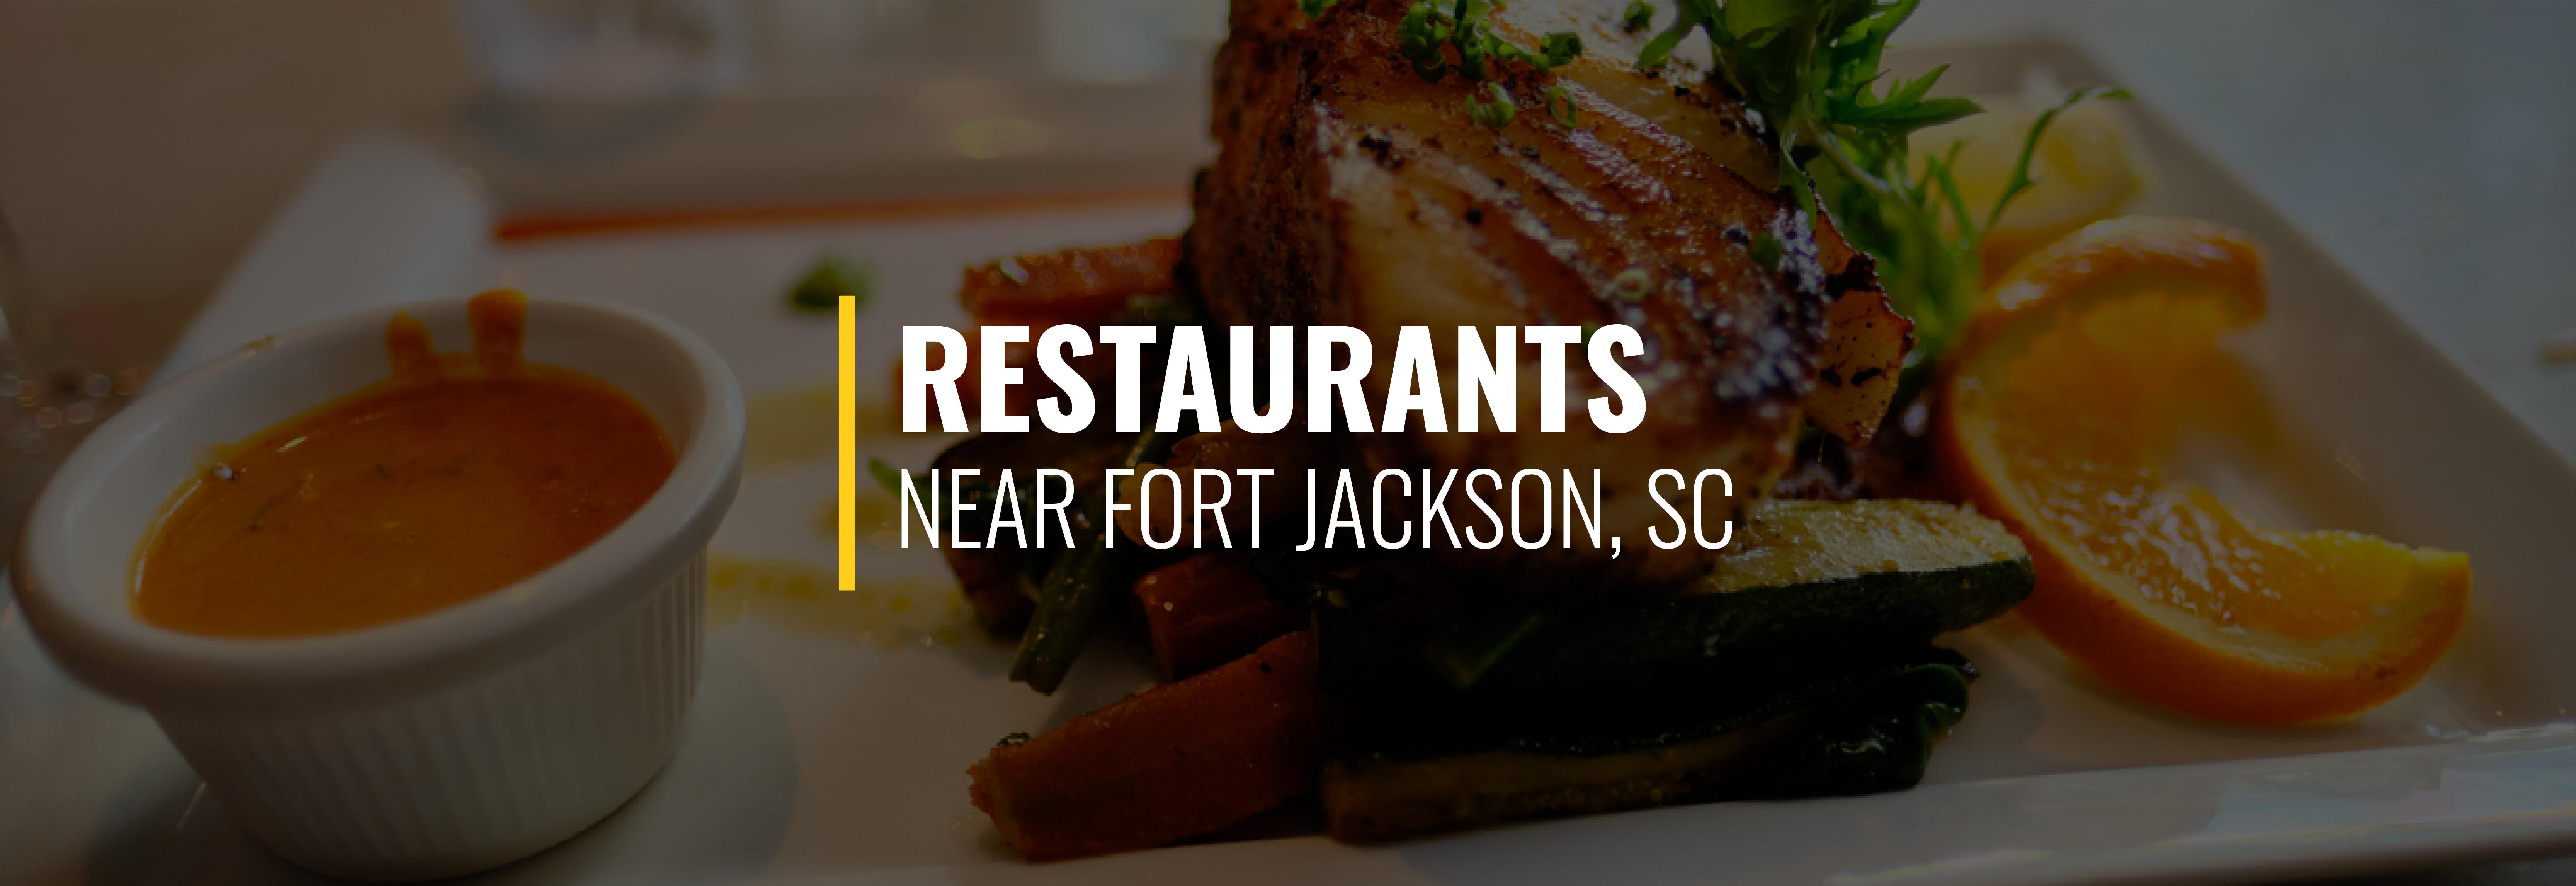 Restaurants Near Fort Jackson